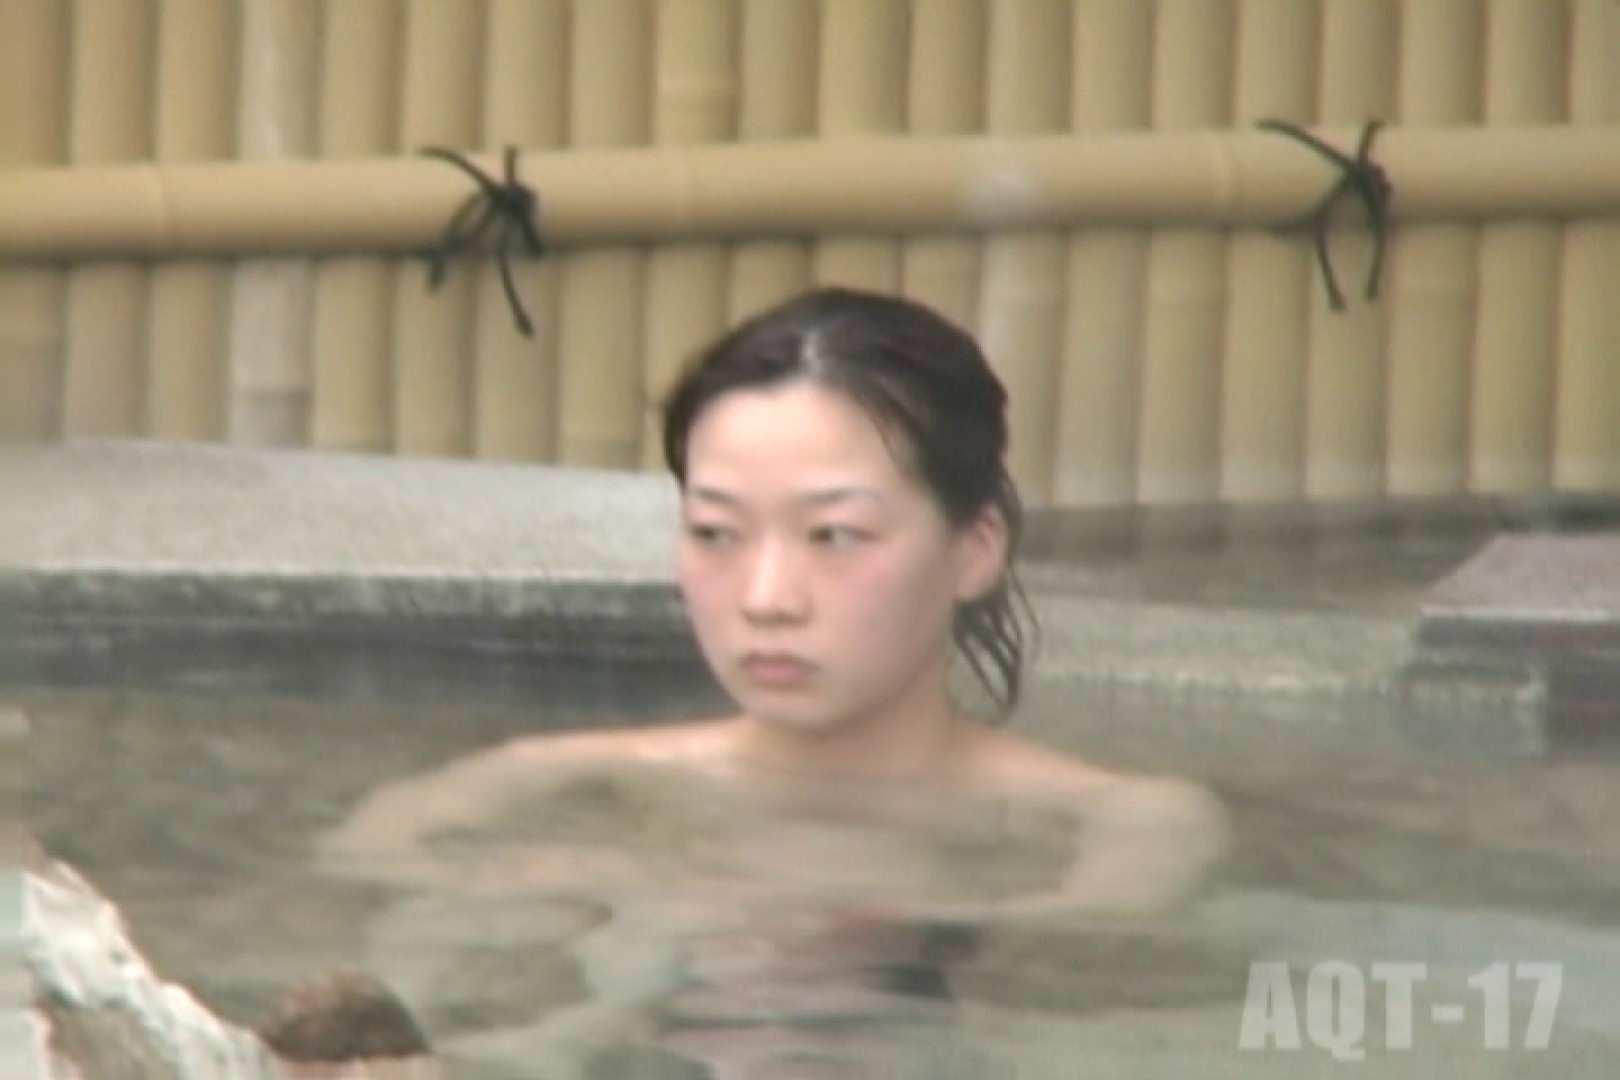 Aquaな露天風呂Vol.848 盗撮師作品  86pic 12